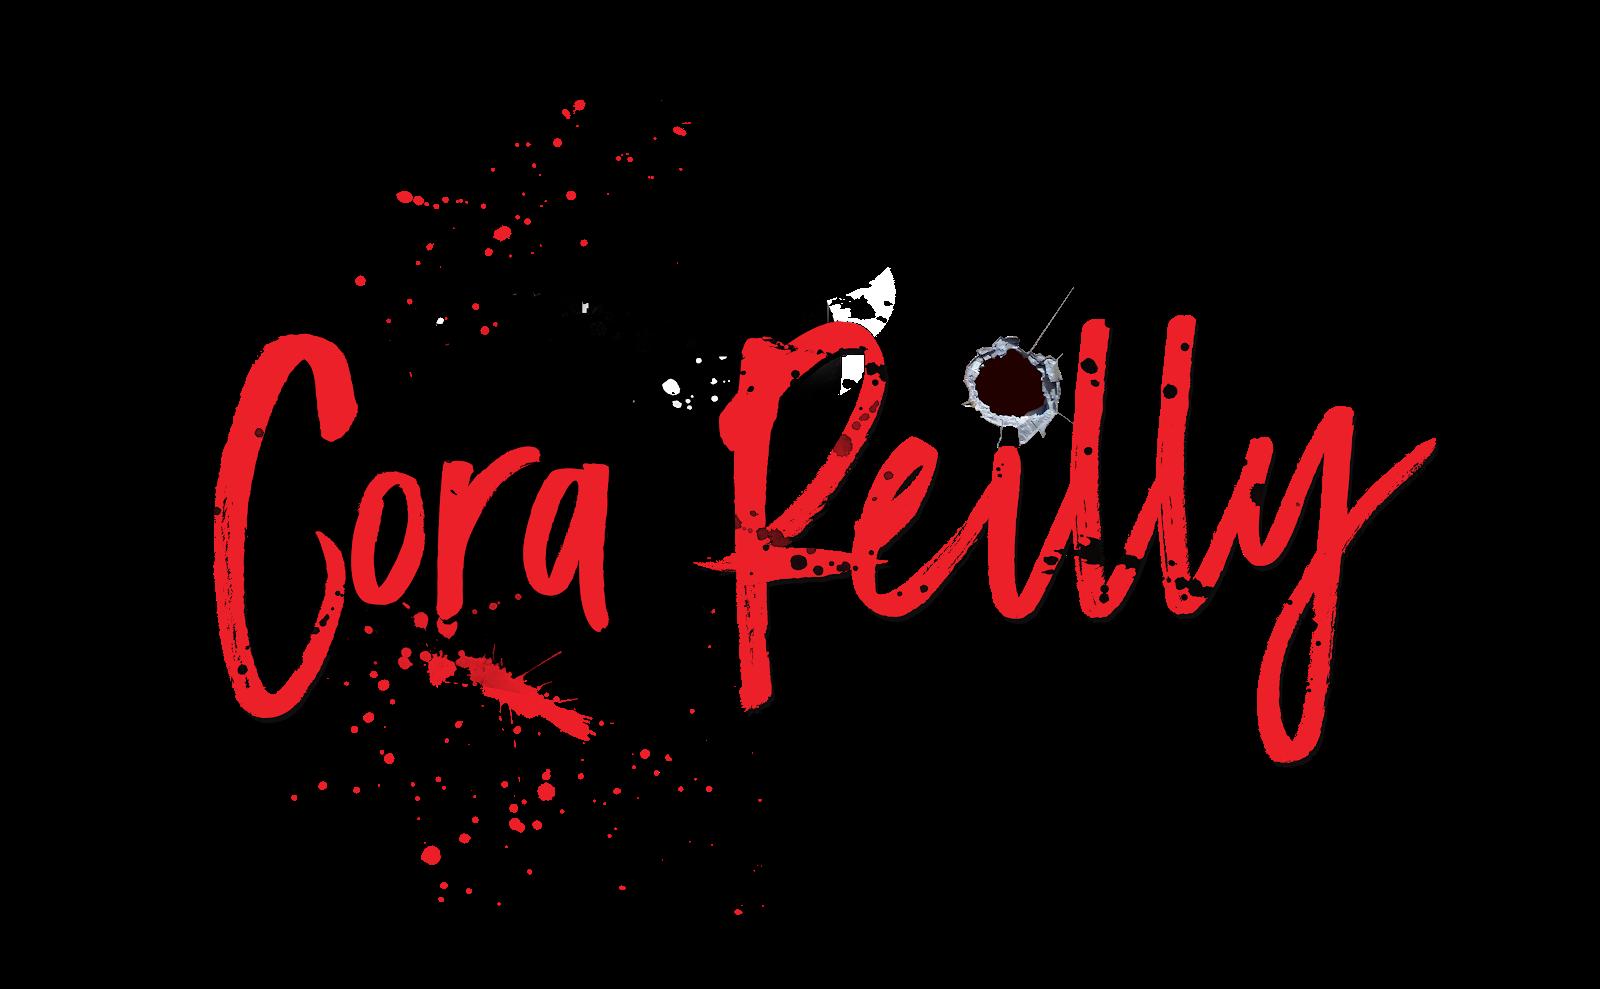 Cora Reilly